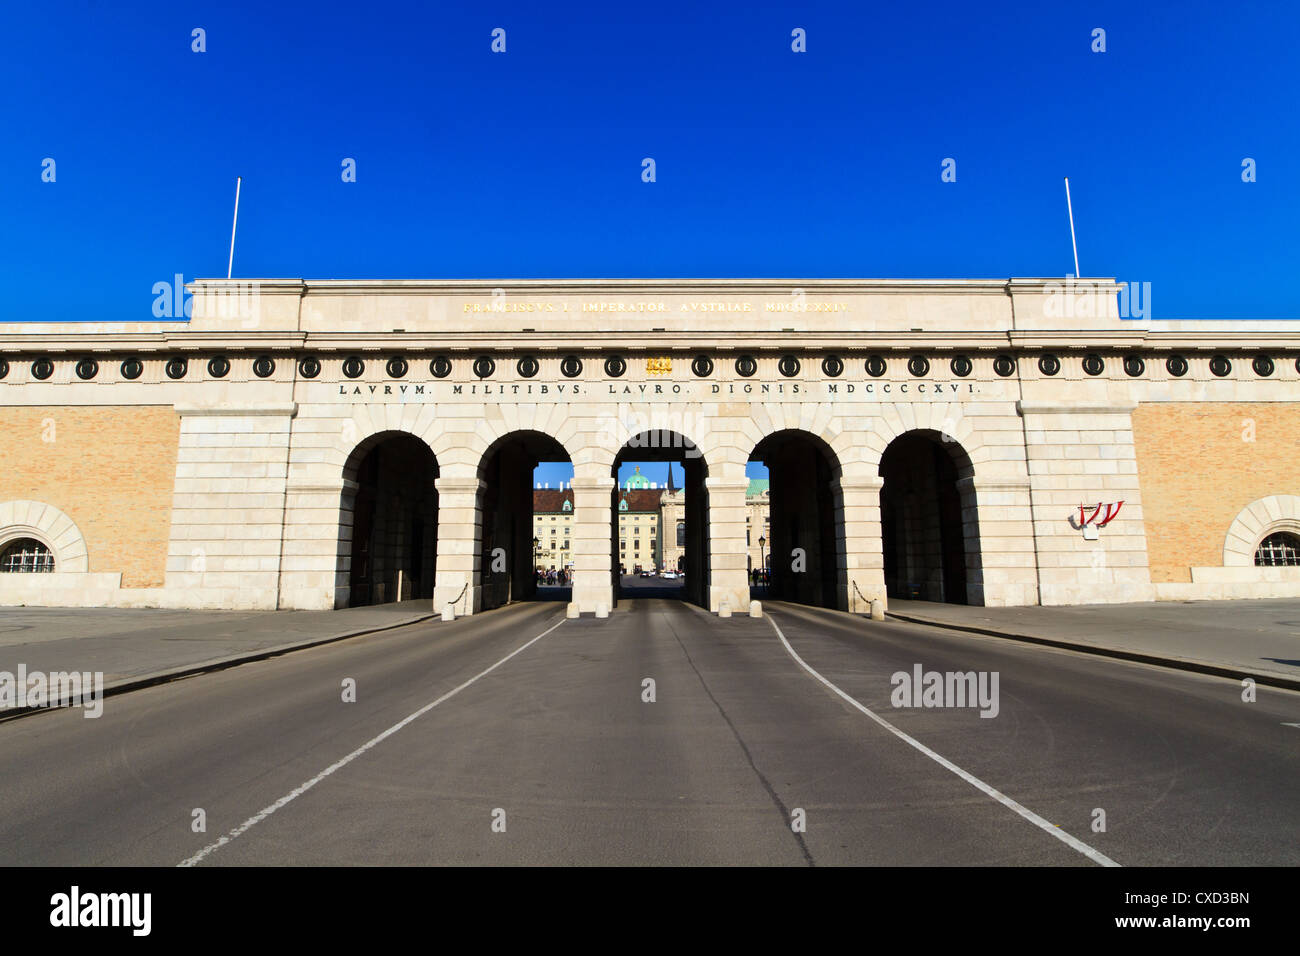 Vienna Heldentor - Entrance to Hofburg and Heldenplatz, Austria - Stock Image